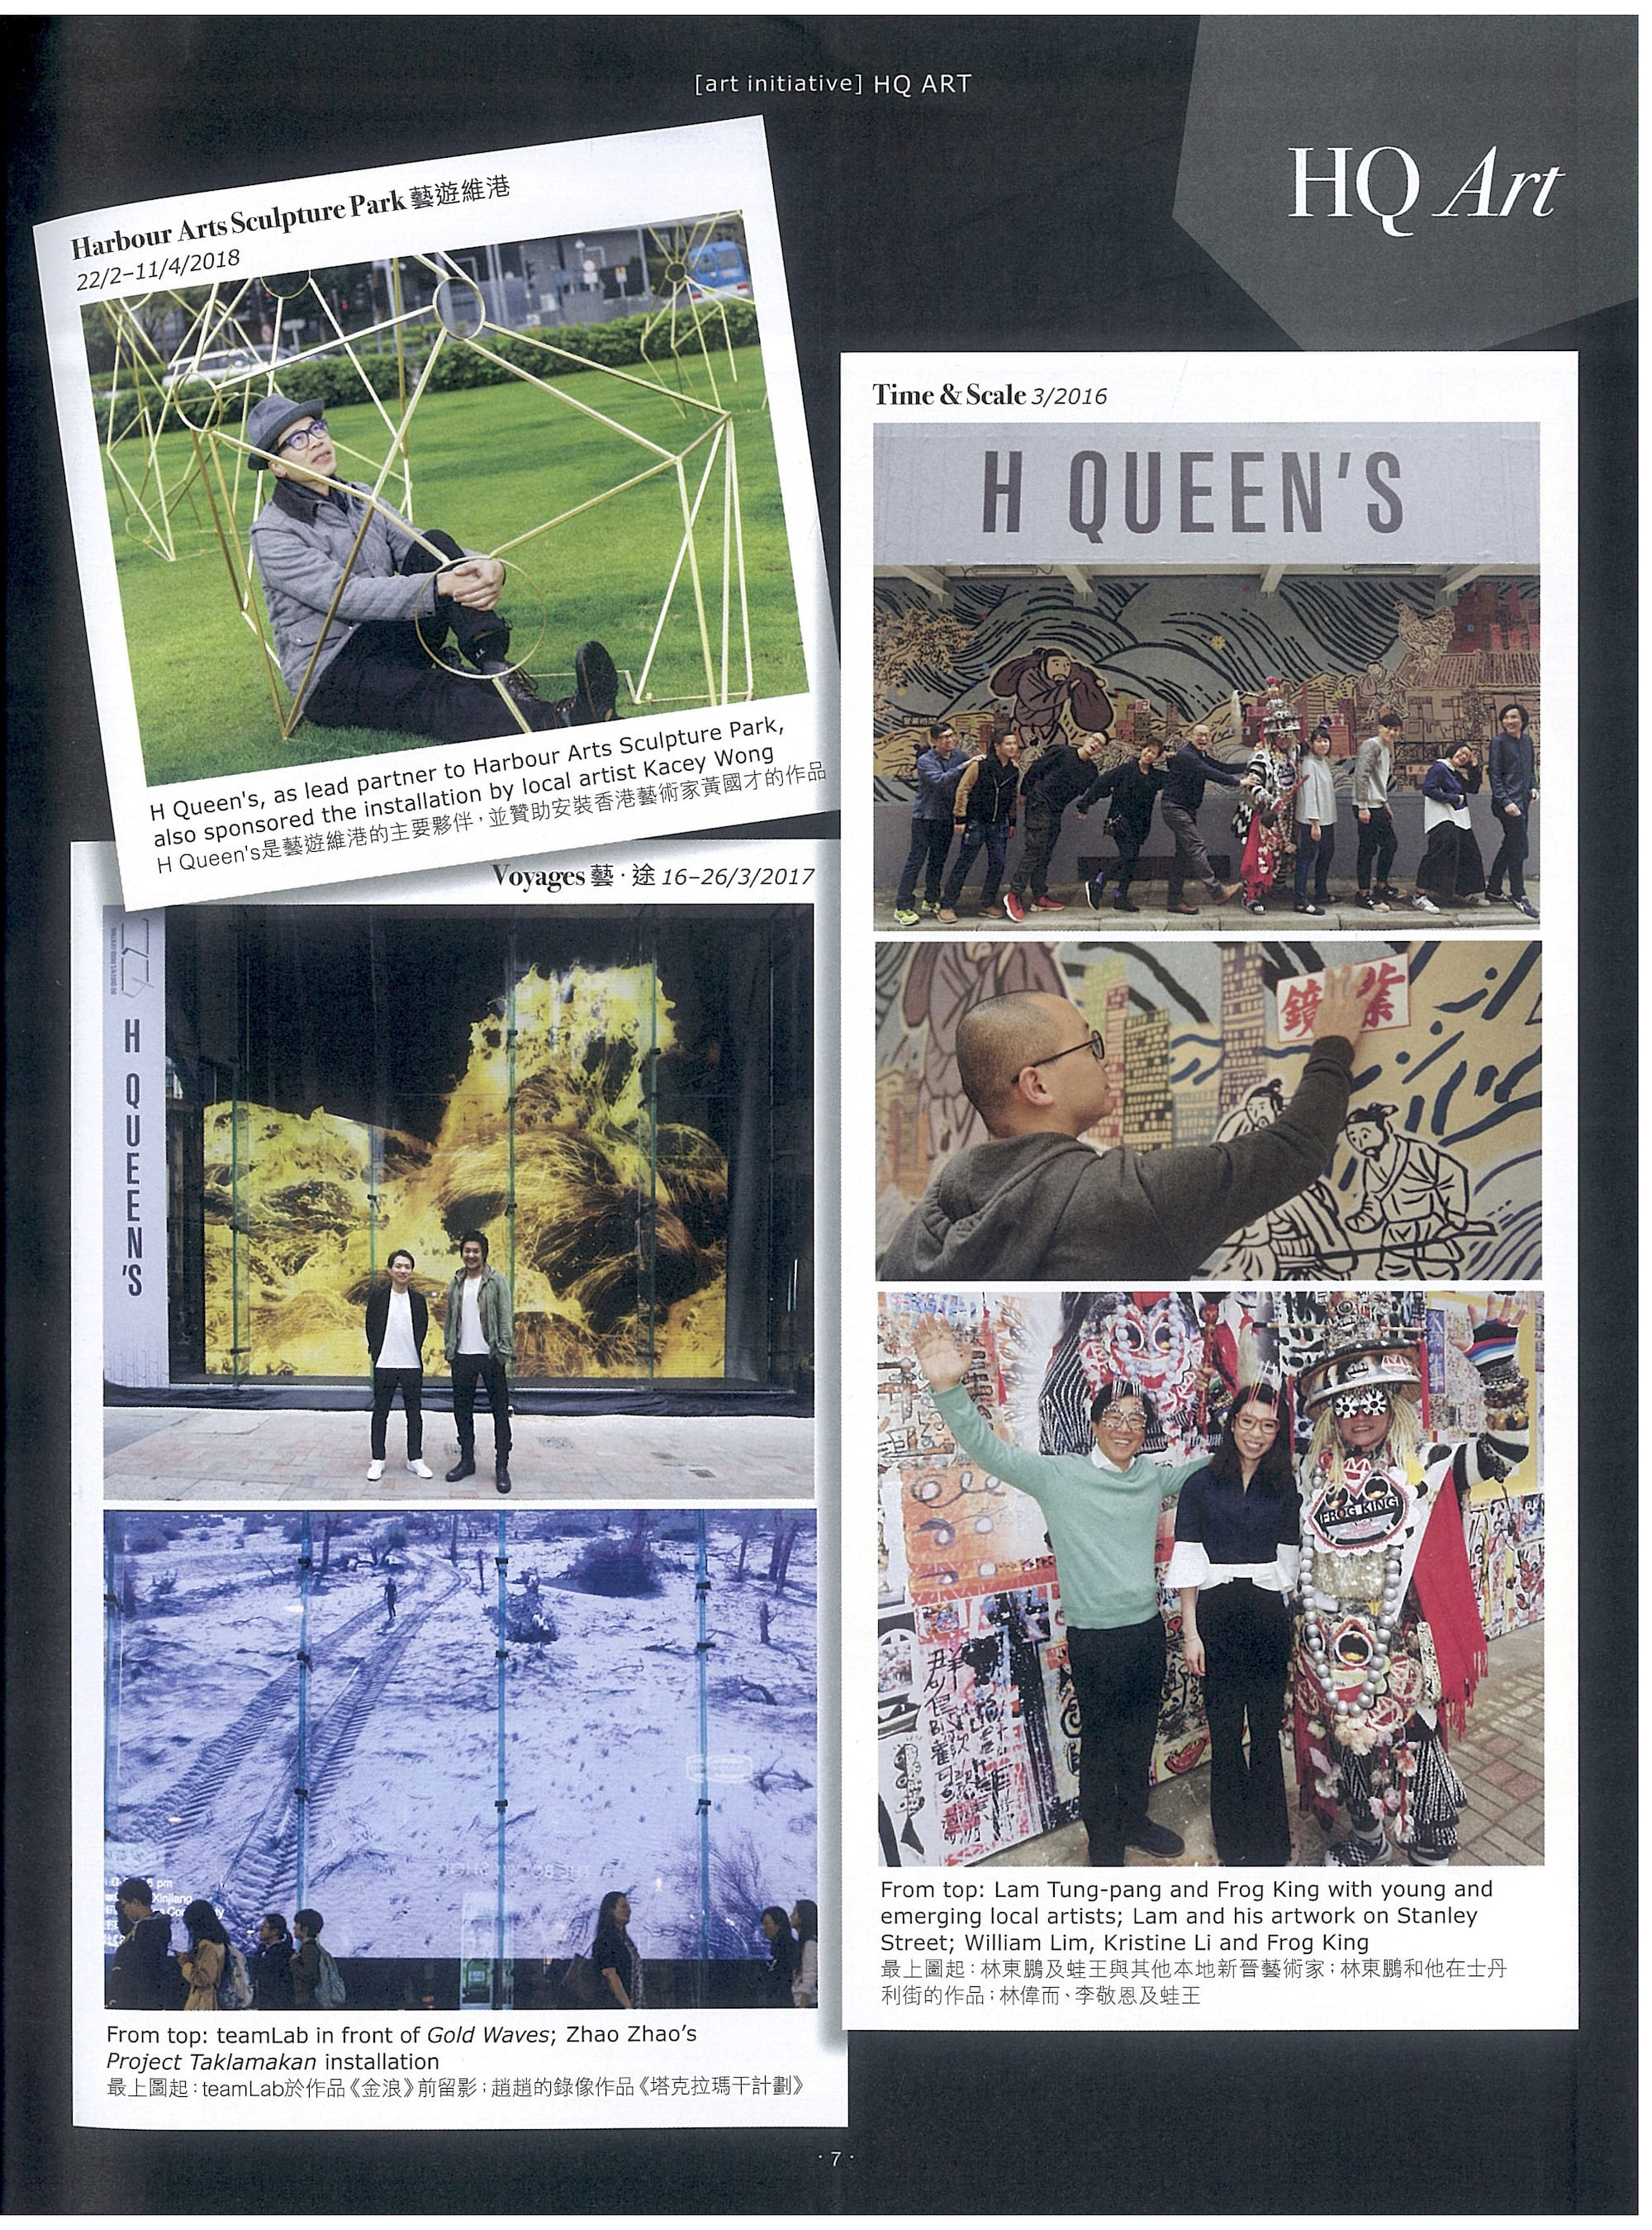 HQ H Queen's - Headquarters of Art and Lifestyle - William Lim